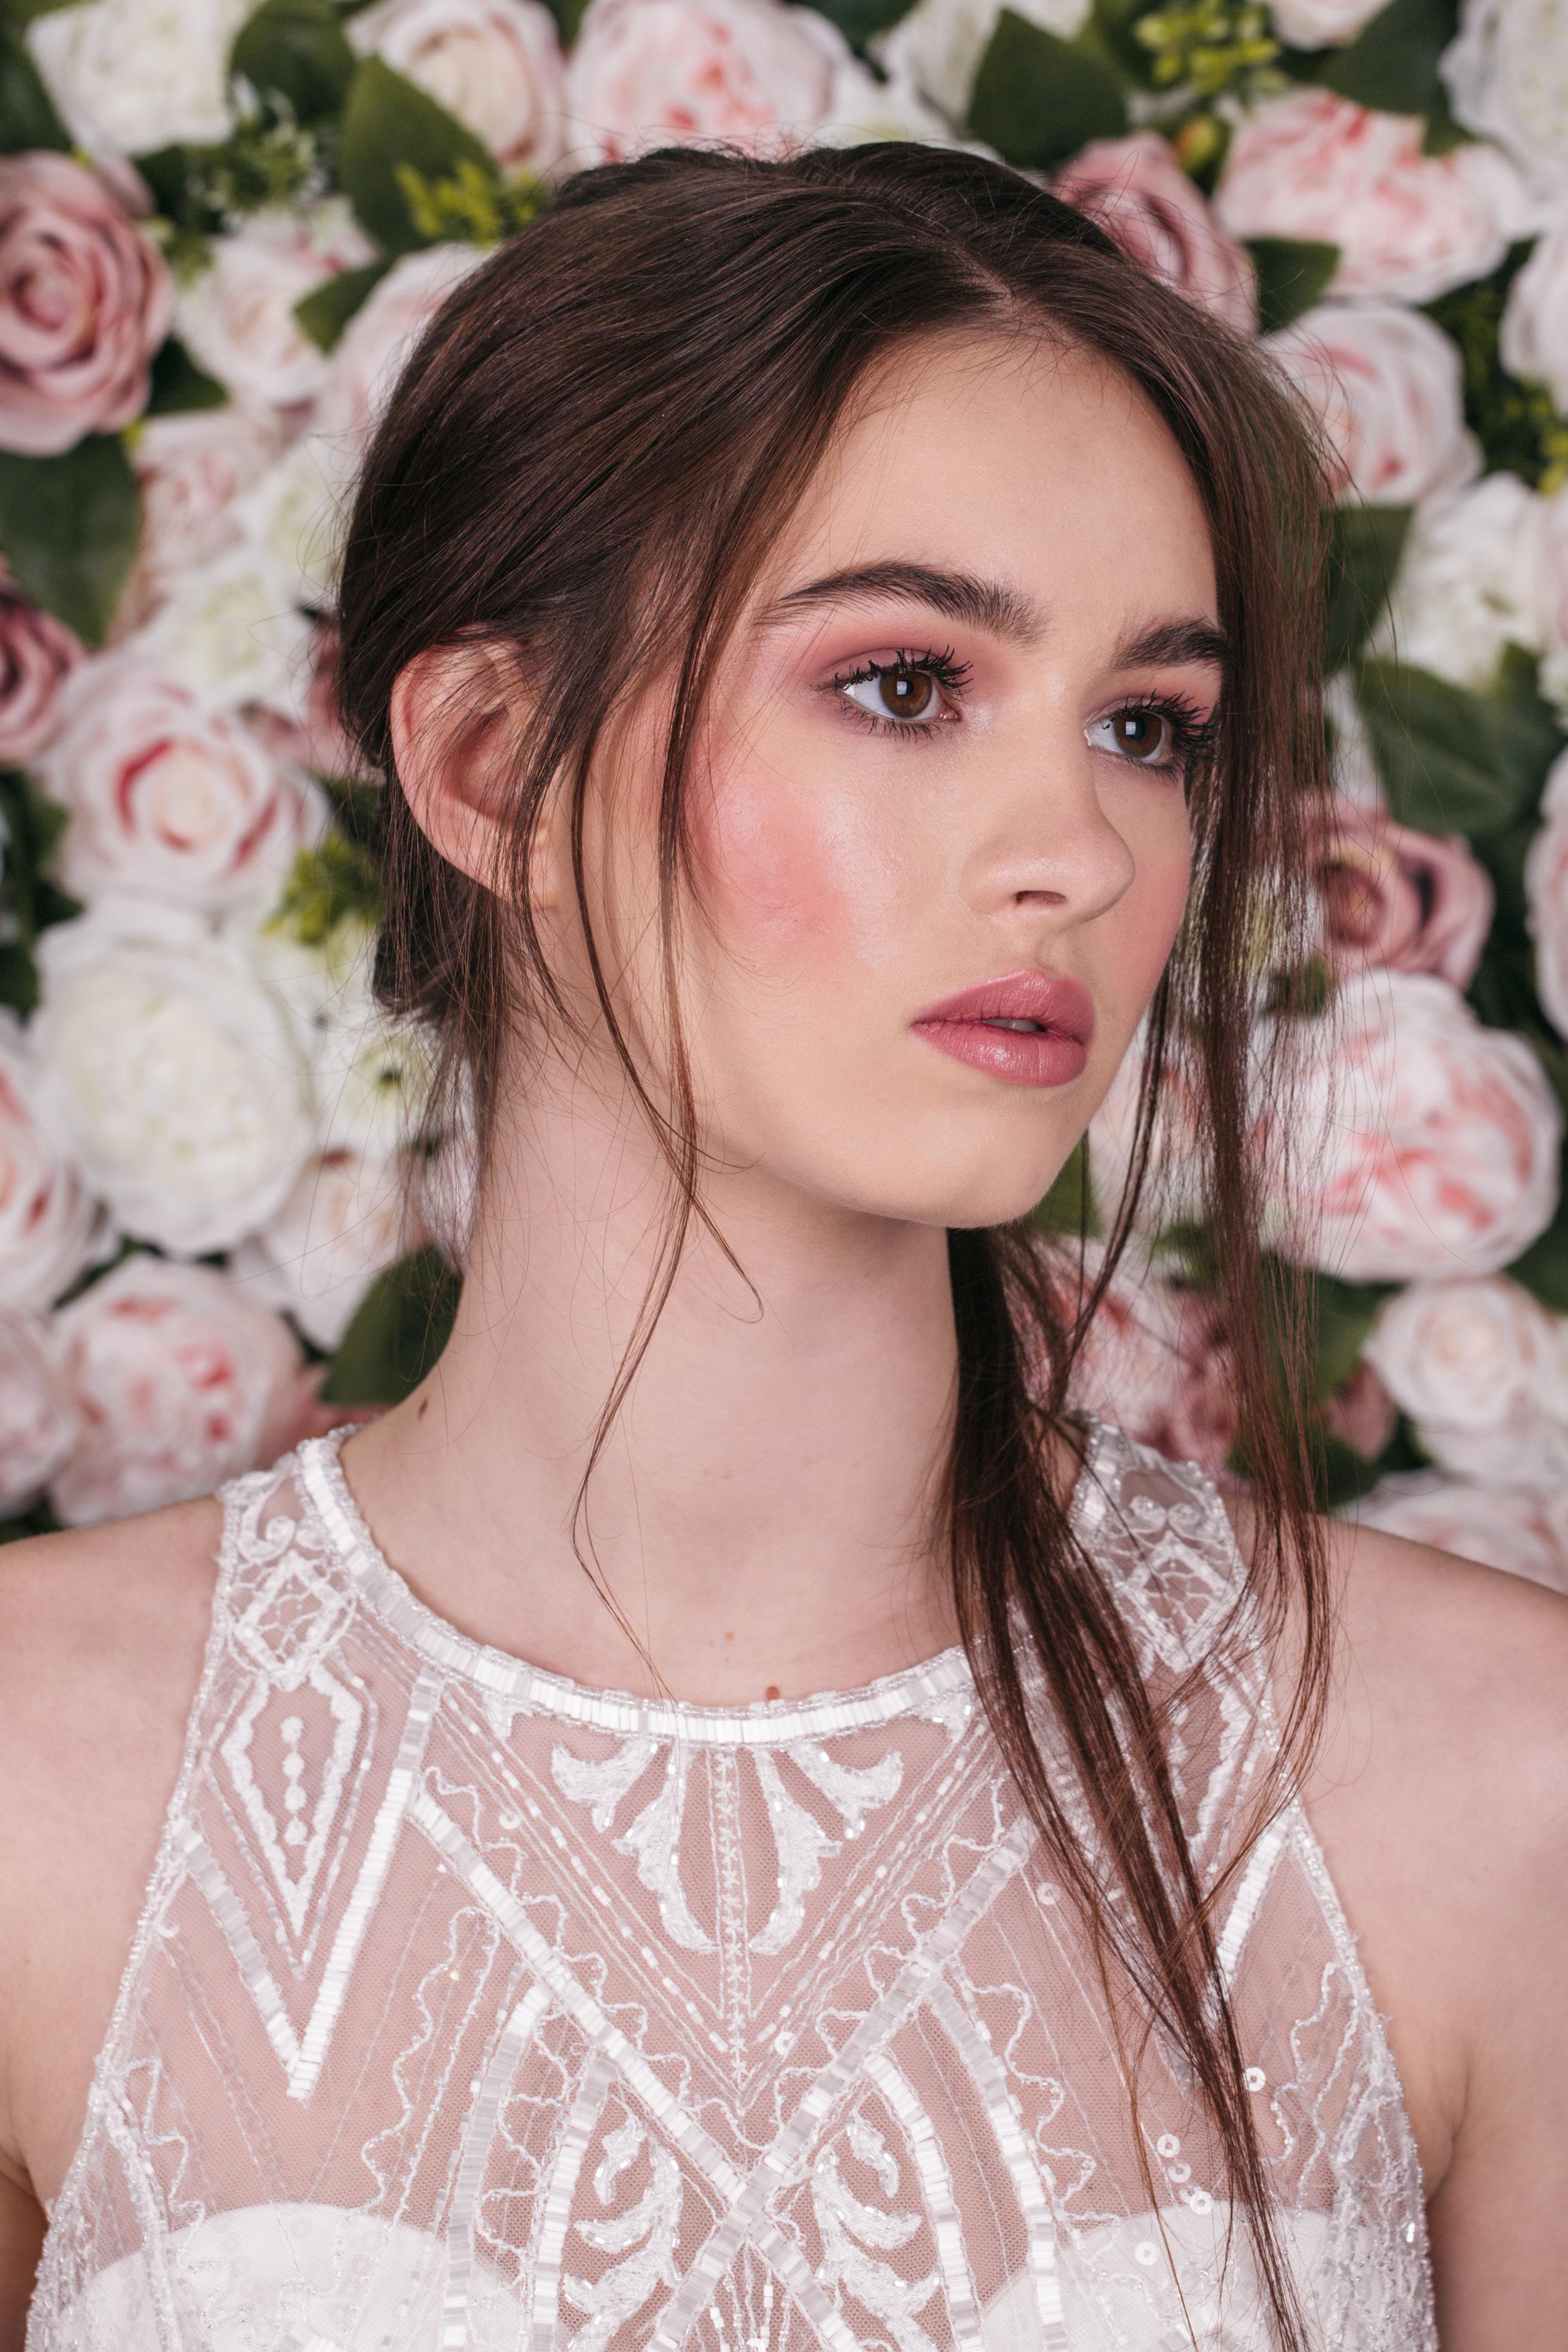 emma barrow flora hello petal your devon and cornwall wedding magazine sophia tolli